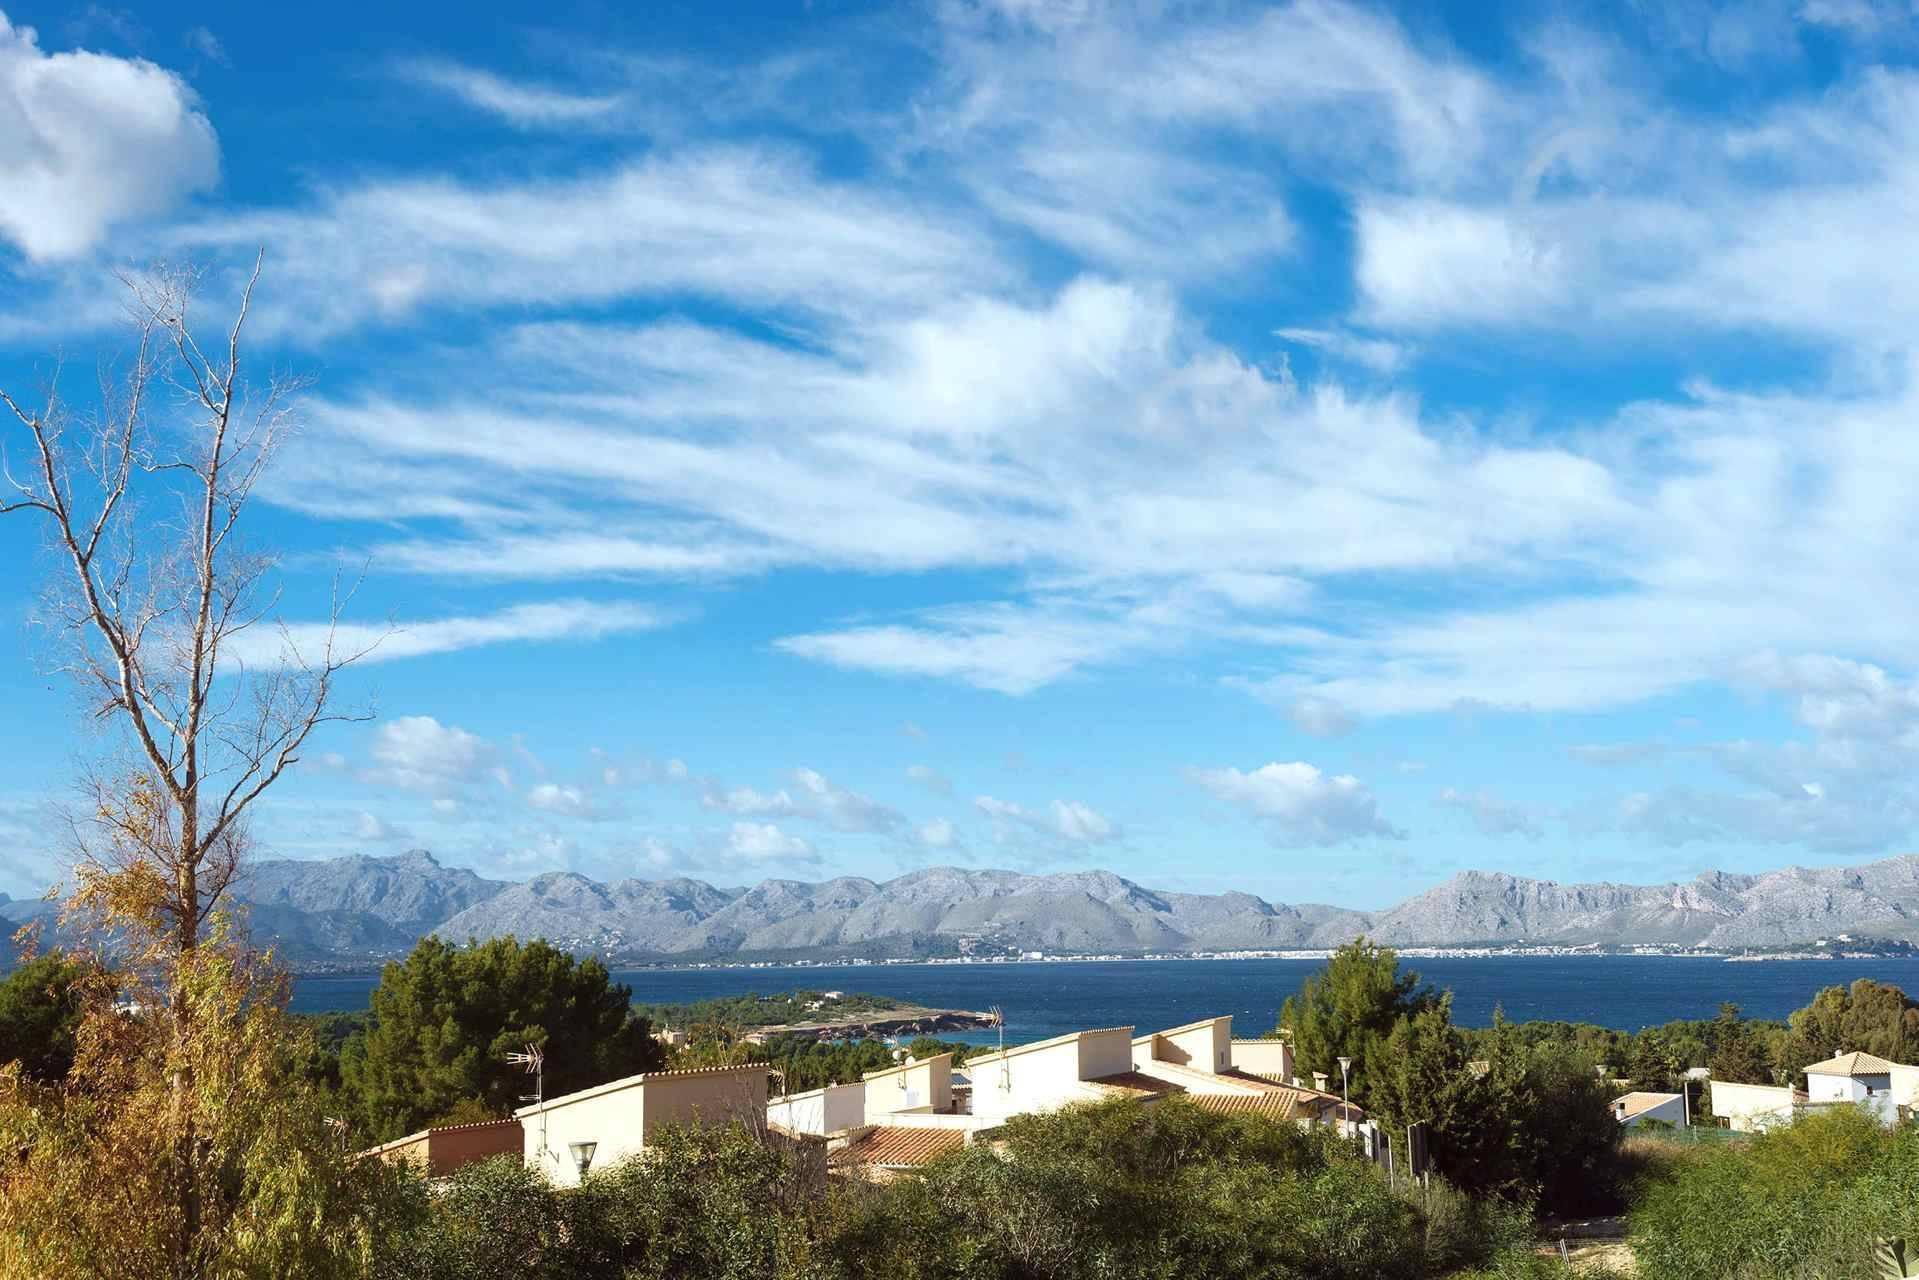 01-282 Ferienhaus Mallorca Norden Meerblick Bild 5